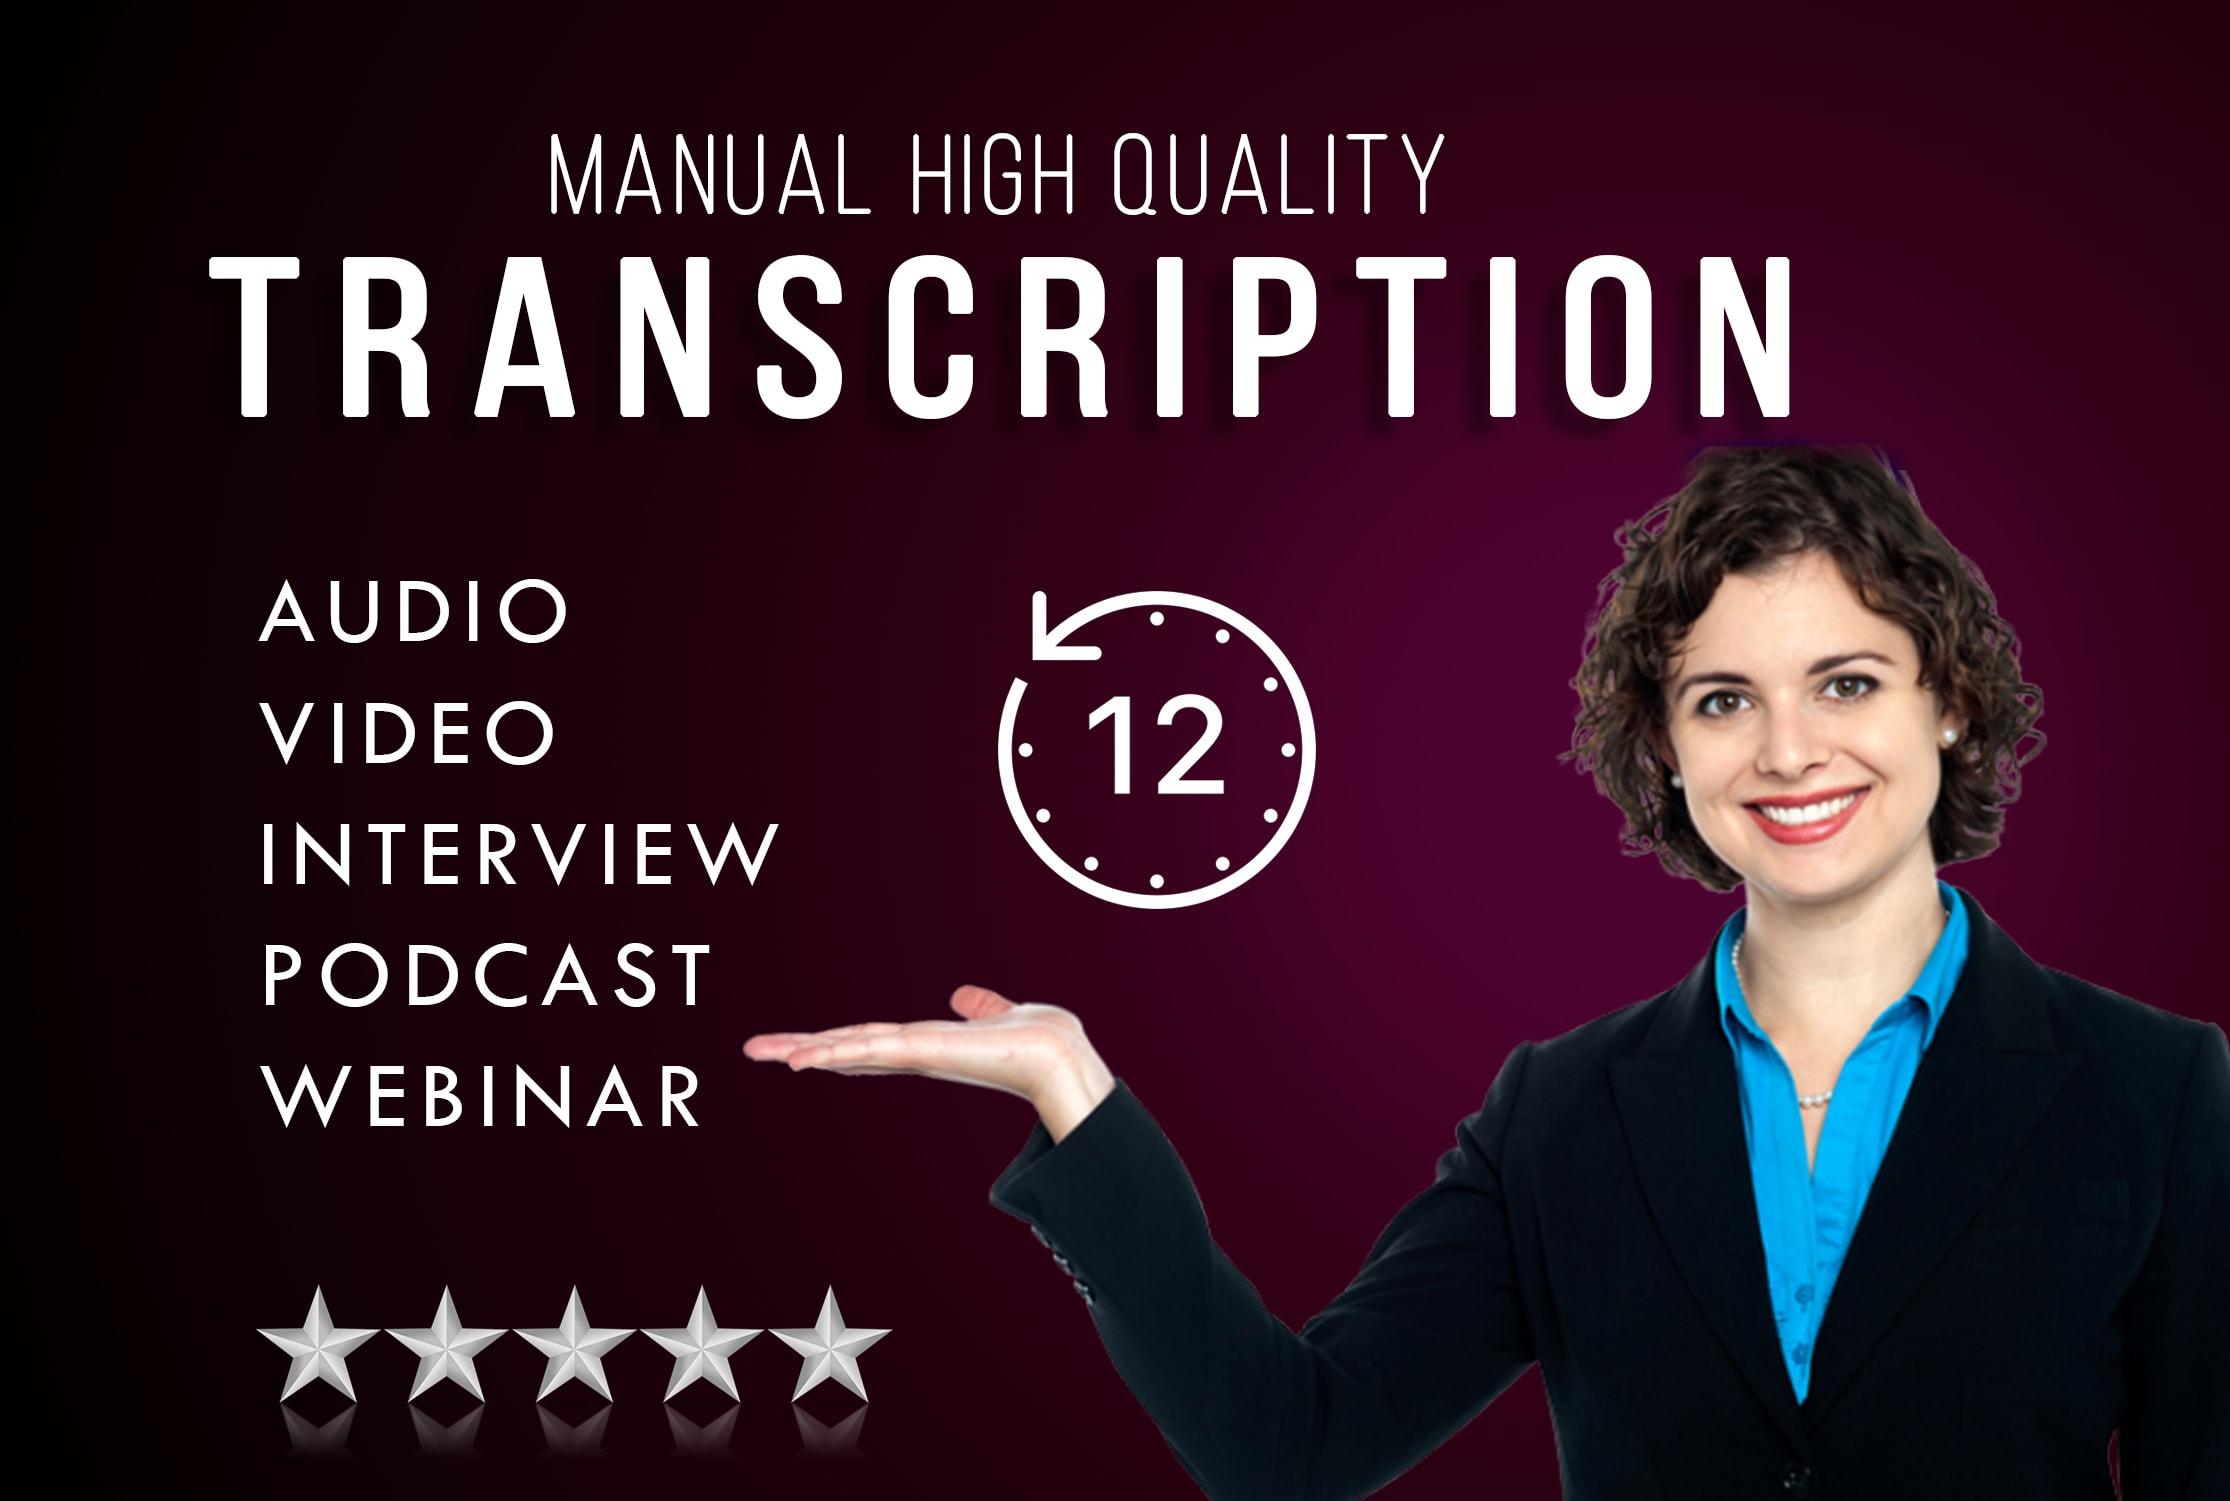 I will transcribe audio and do video transcription